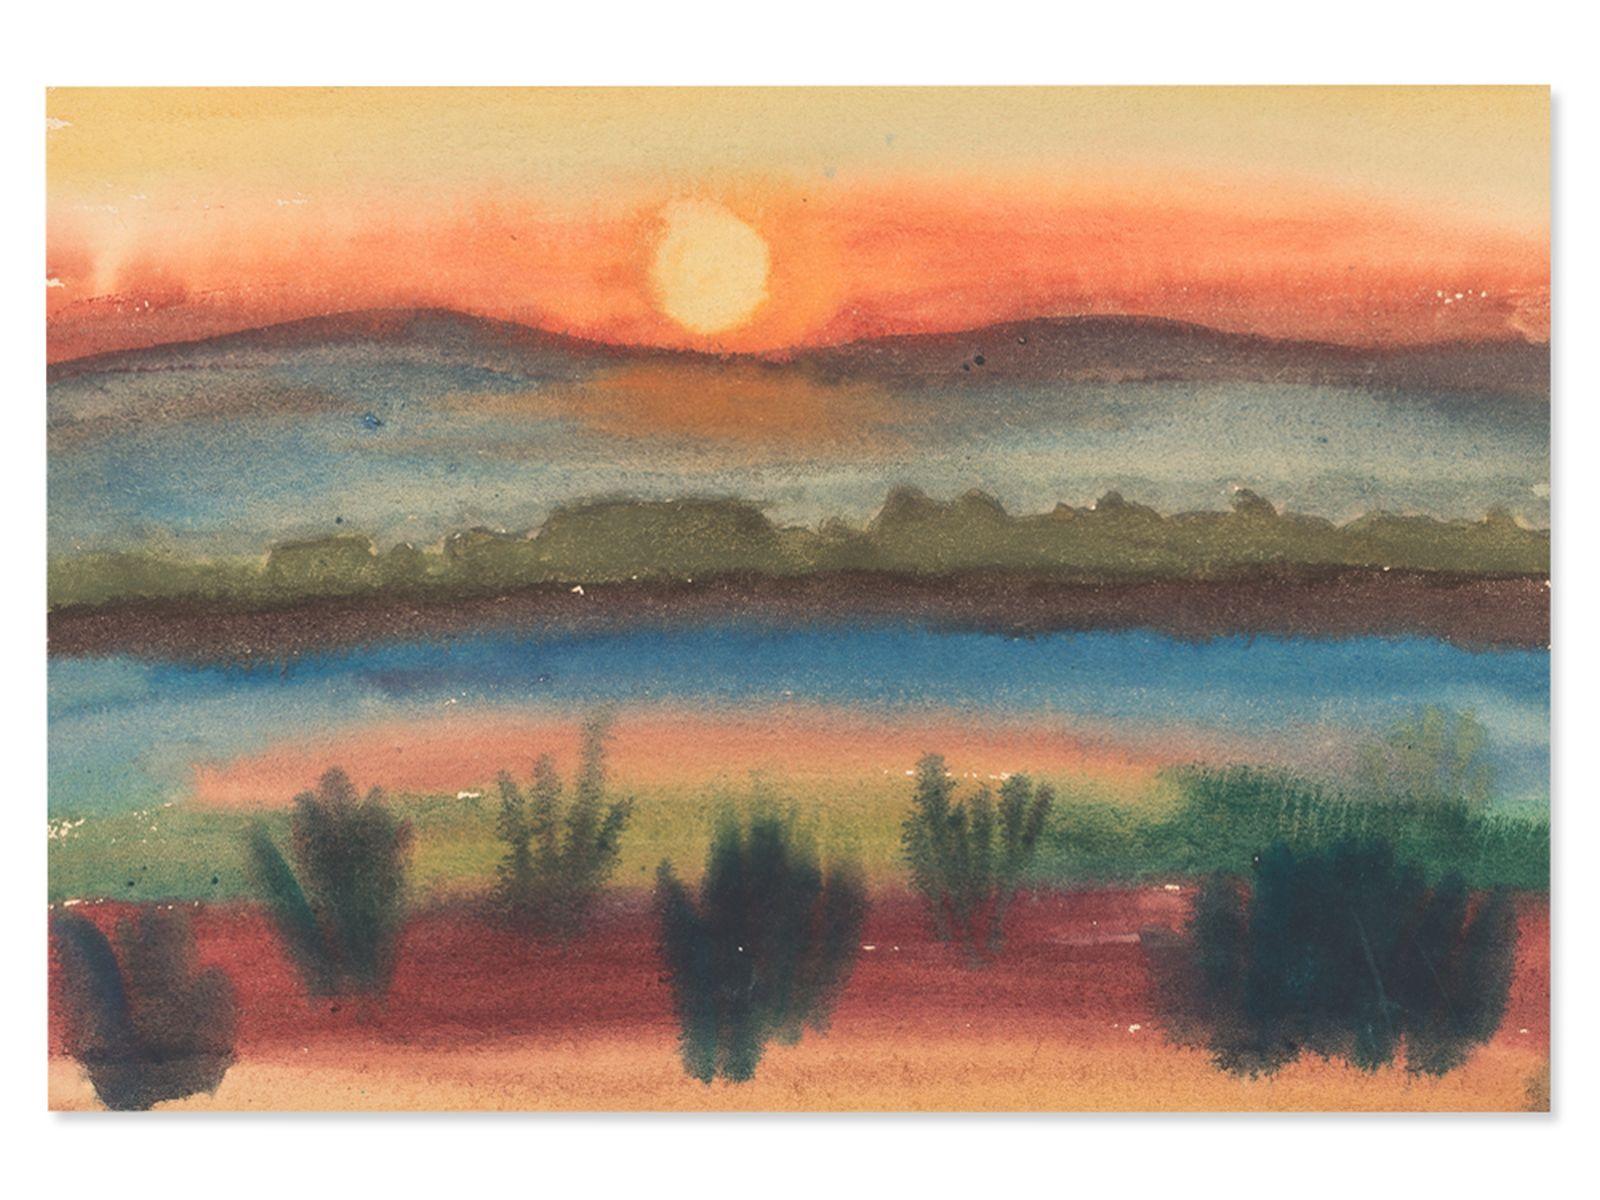 "#95 Rudolf Petrik, ""Sunset old Danube"" c. 1950 | Rudolf Petrik (1922-1991), ""Sonnenuntergang Alte Donau"" ca. 1950 Image"